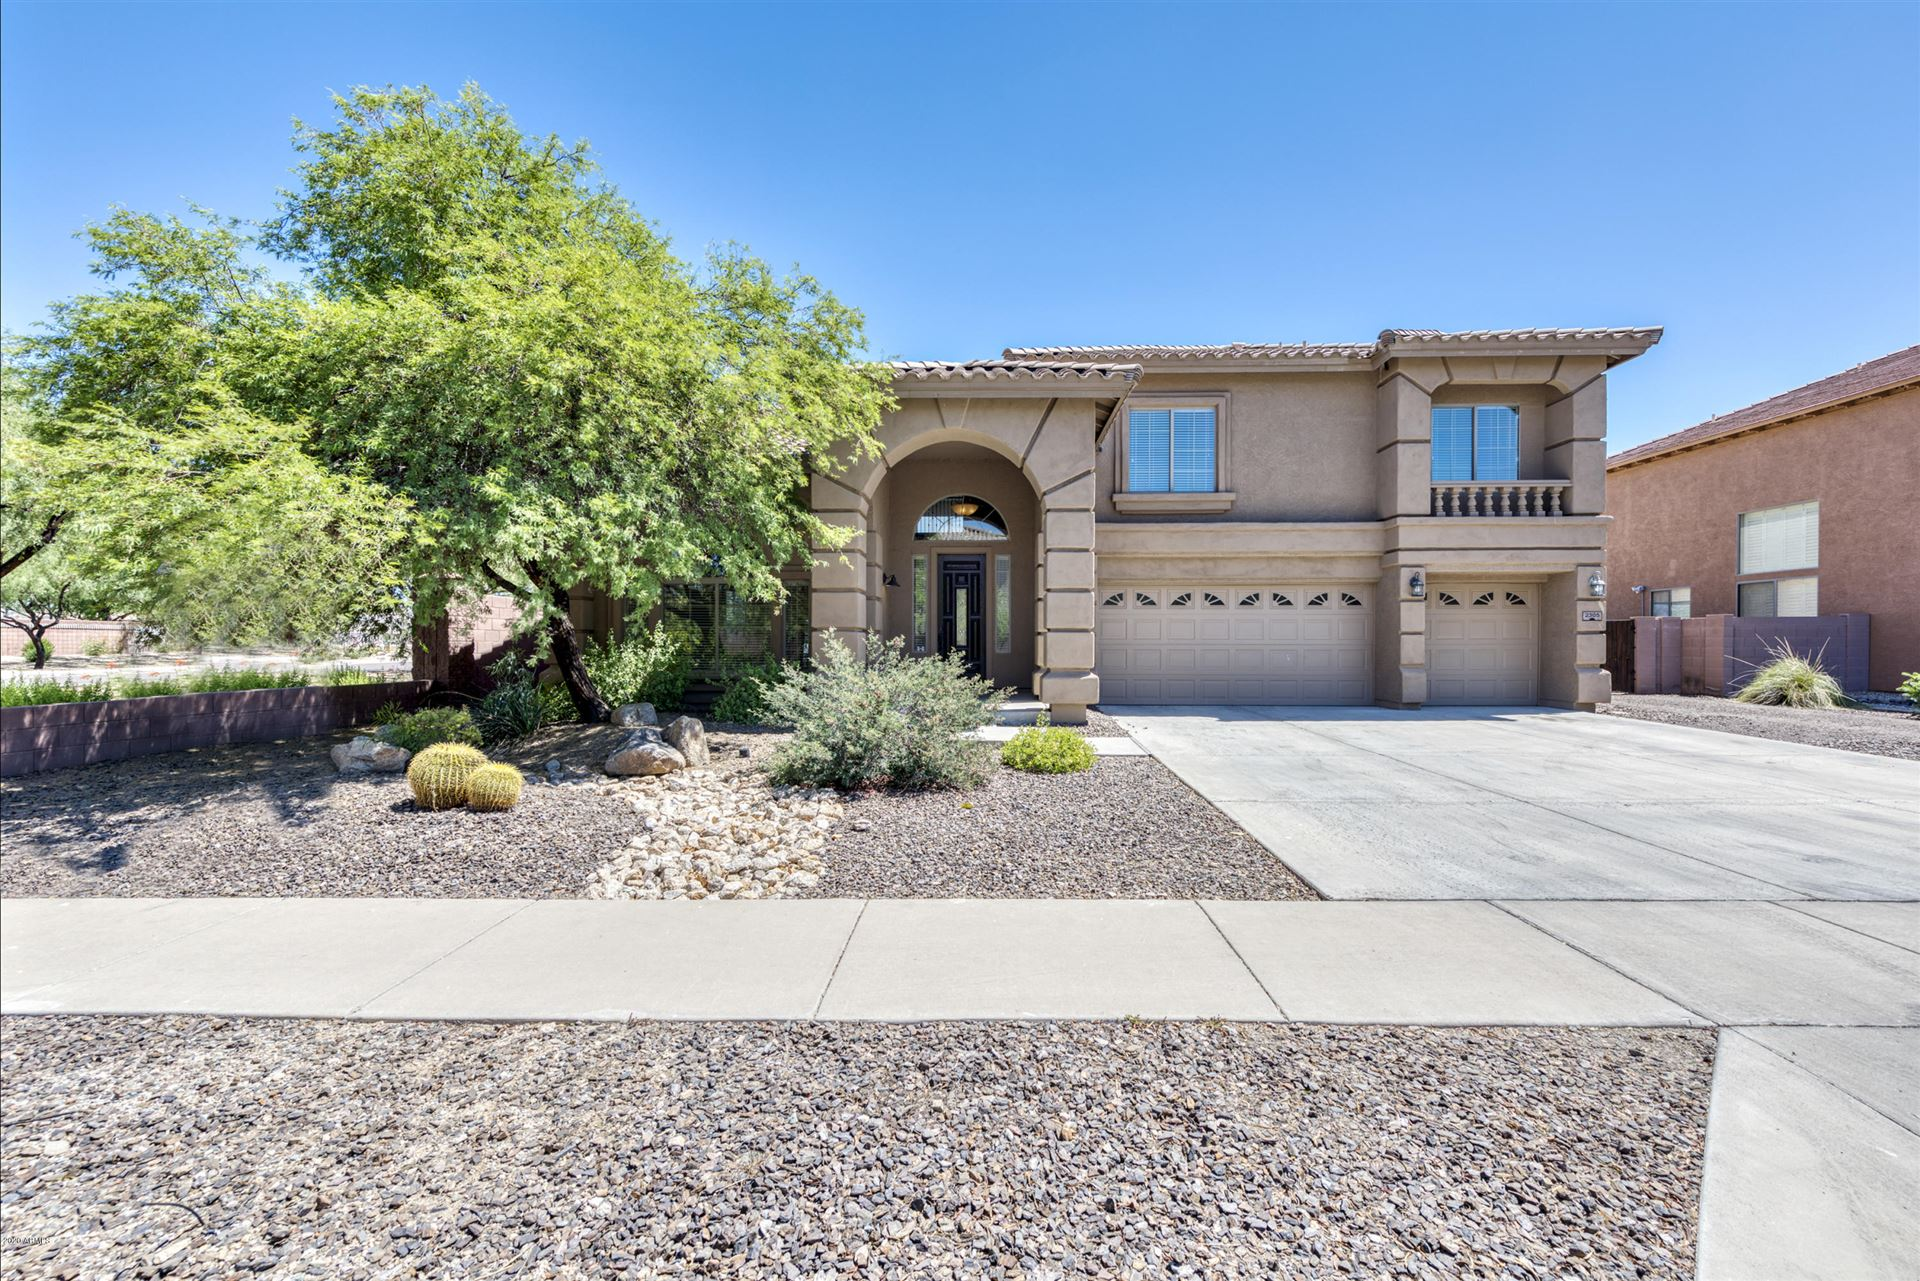 2305 W BUCKHORN Trail, Phoenix, AZ 85085 - MLS#: 6077575